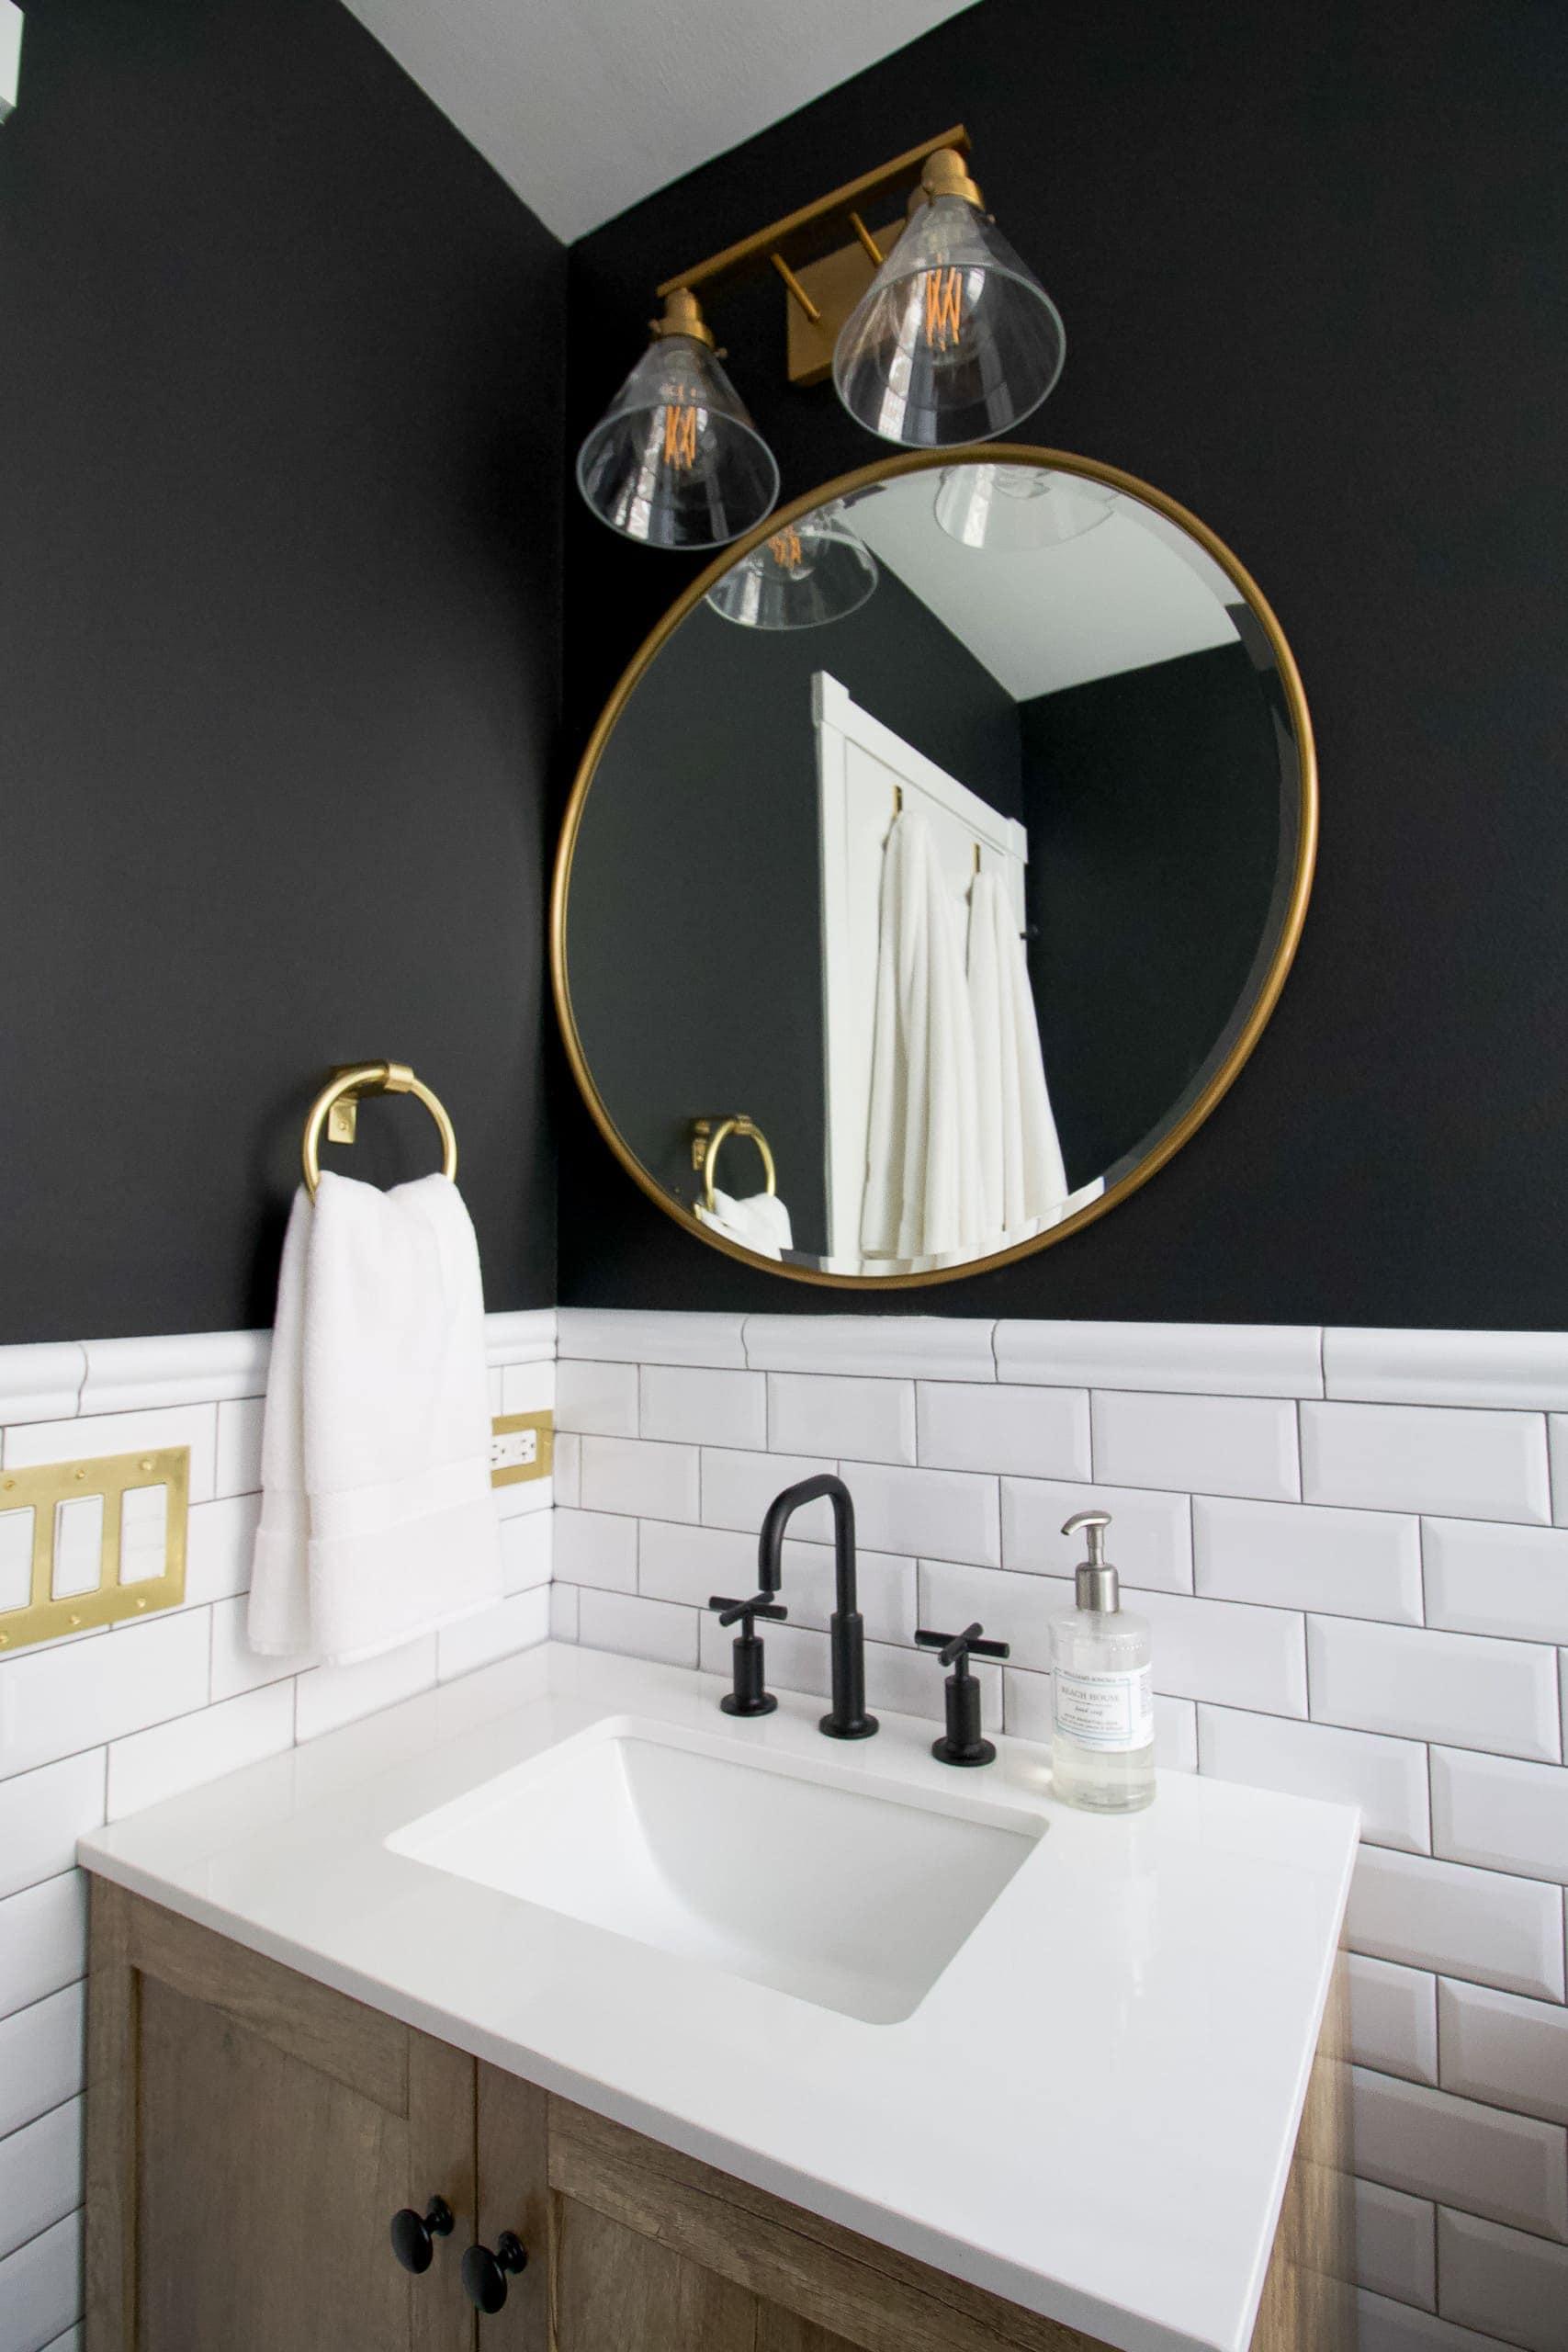 A bathroom vanity with gold mirror